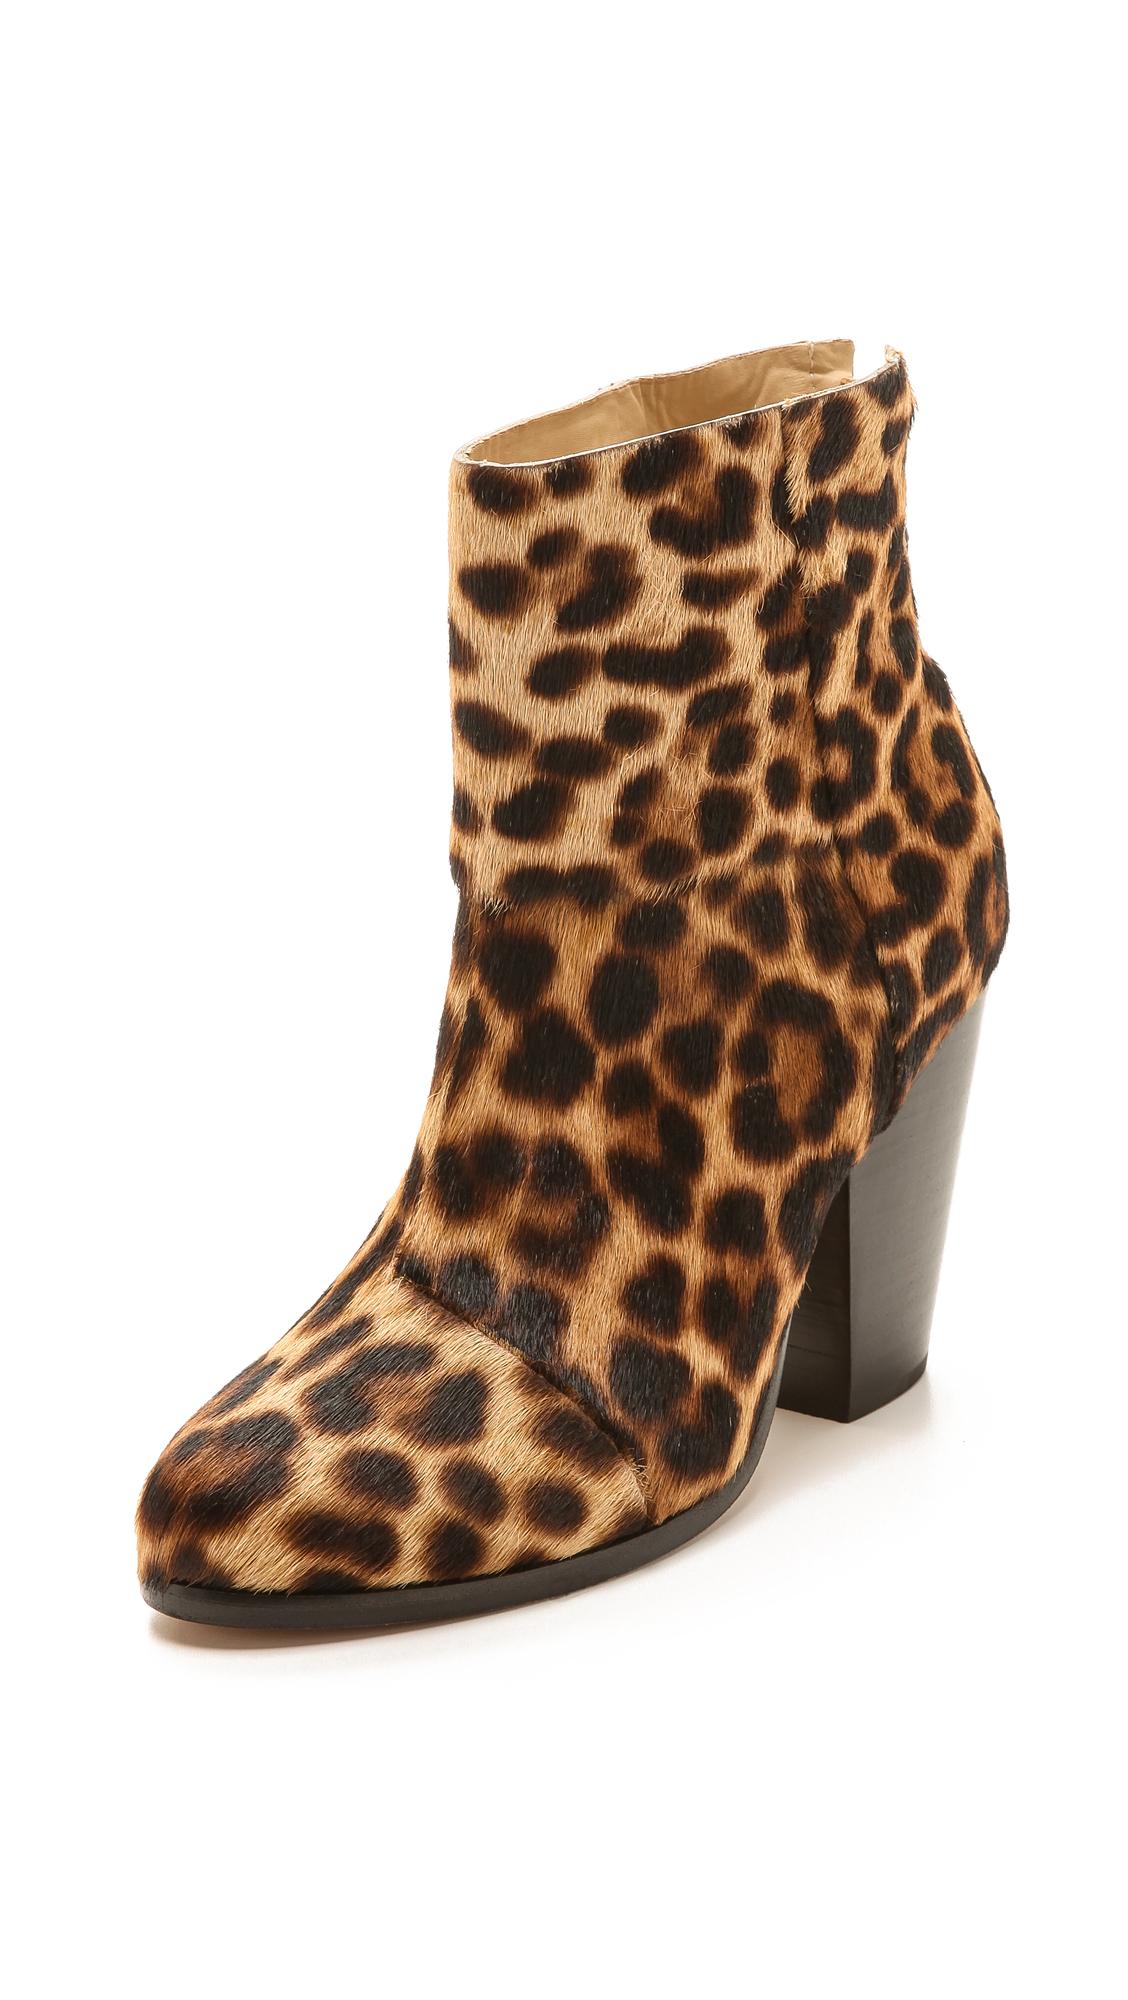 Rag Amp Bone Newbury Leopard Print Calf Hair Ankle Boots Lyst